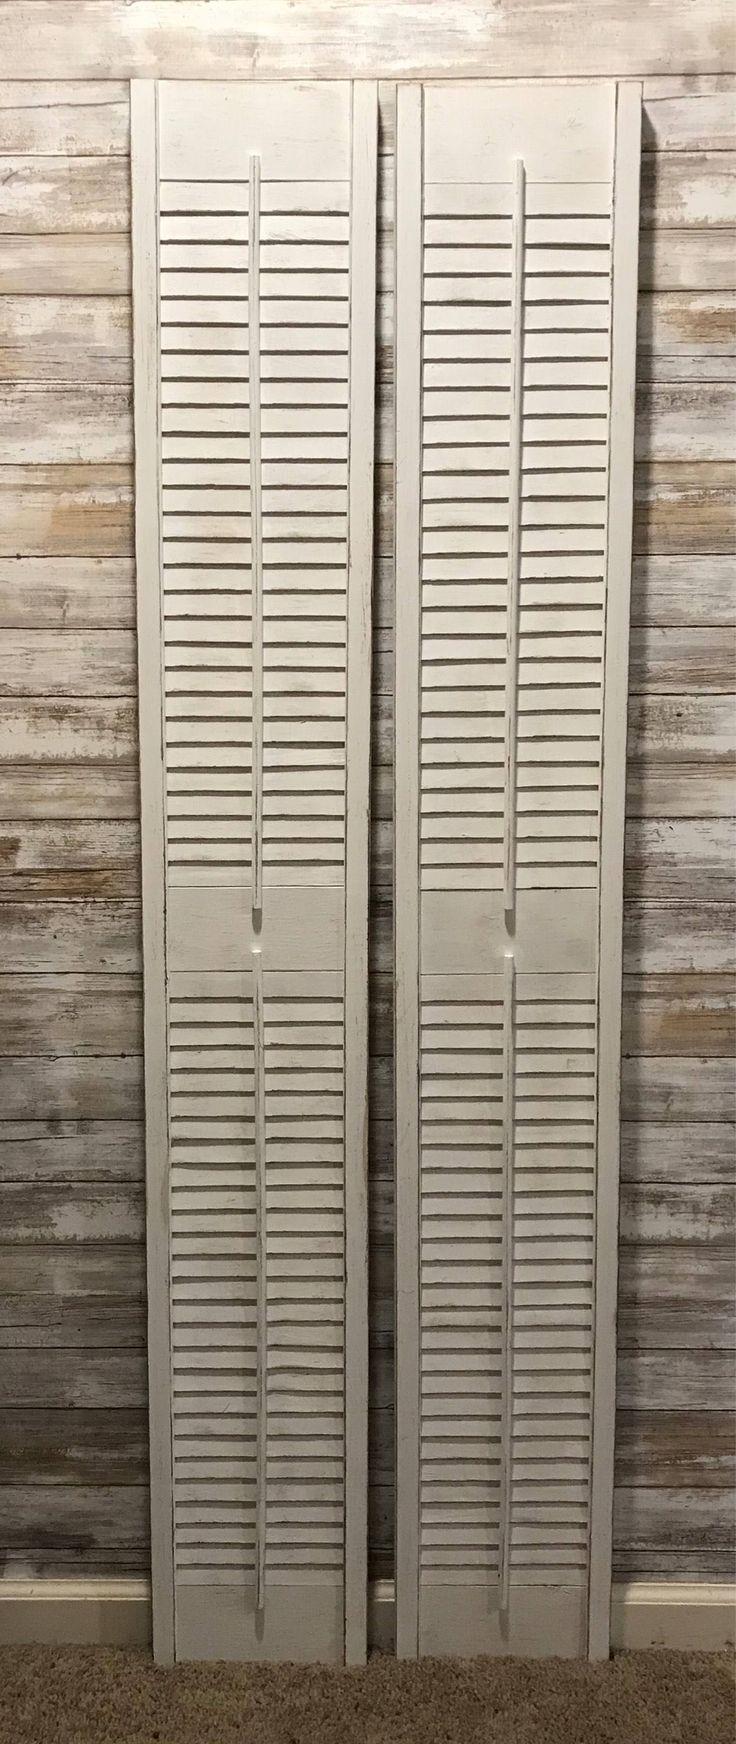 Custom Shutters, Wooden Shutters,  Vintage Shutters, farmhouse shutters by myrusticchicboutique on Etsy